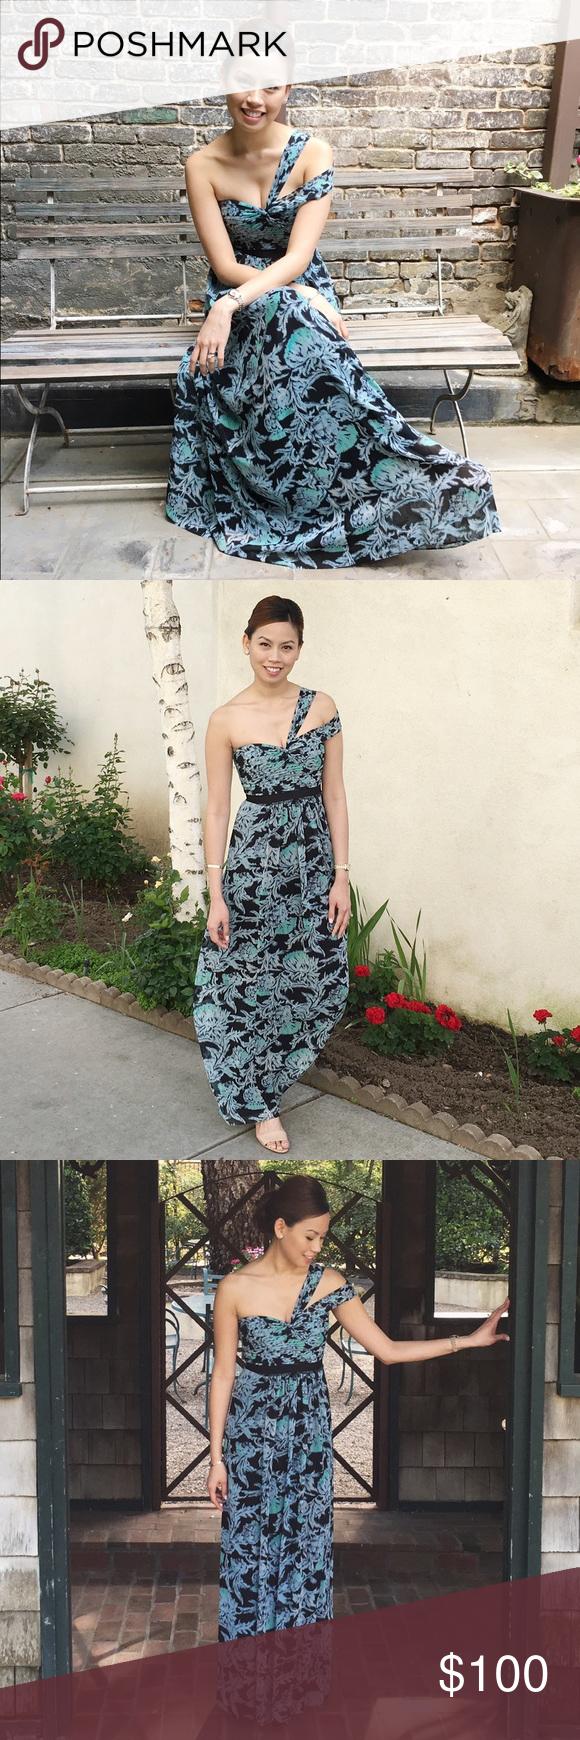 BCBG Printed Long Dress BCBG Long Printed Dress • Size: 2 BCBGMaxAzria Dresses One Shoulder